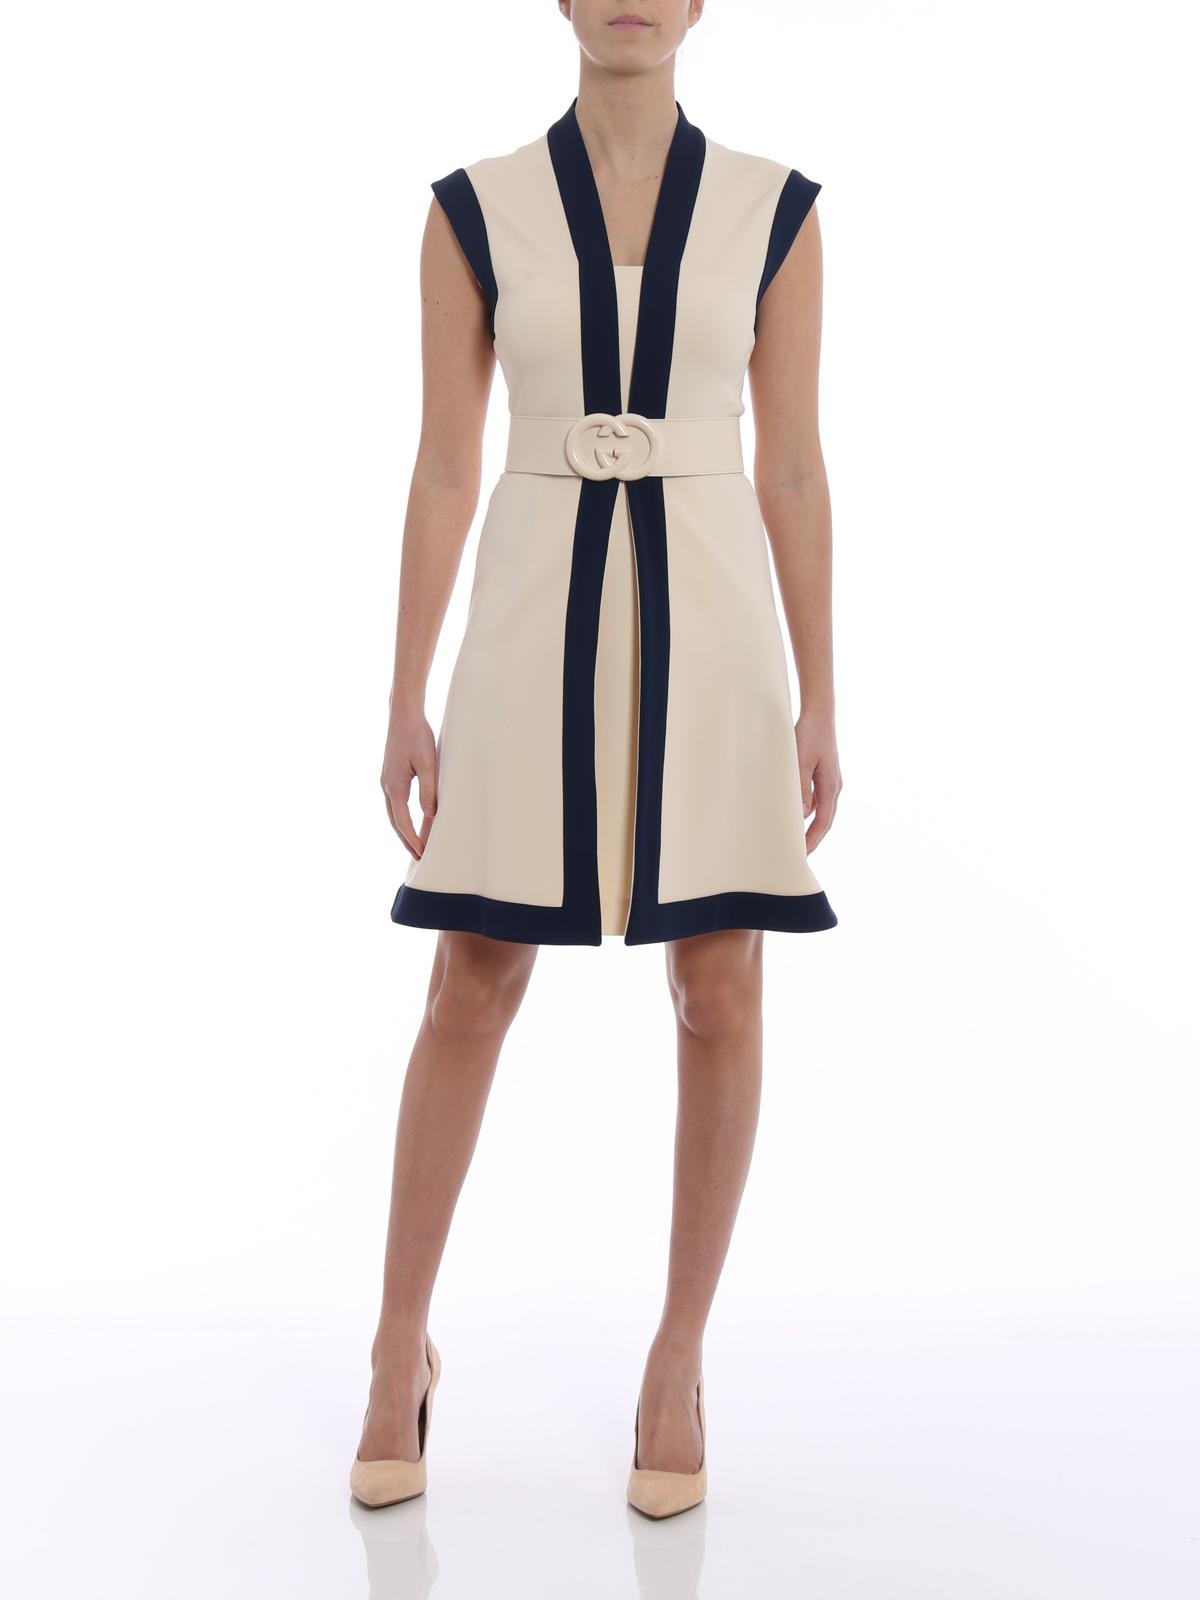 Gucci - Kurzes Kleid - Hellbeige - Kurze Kleider - 17X17S17172170